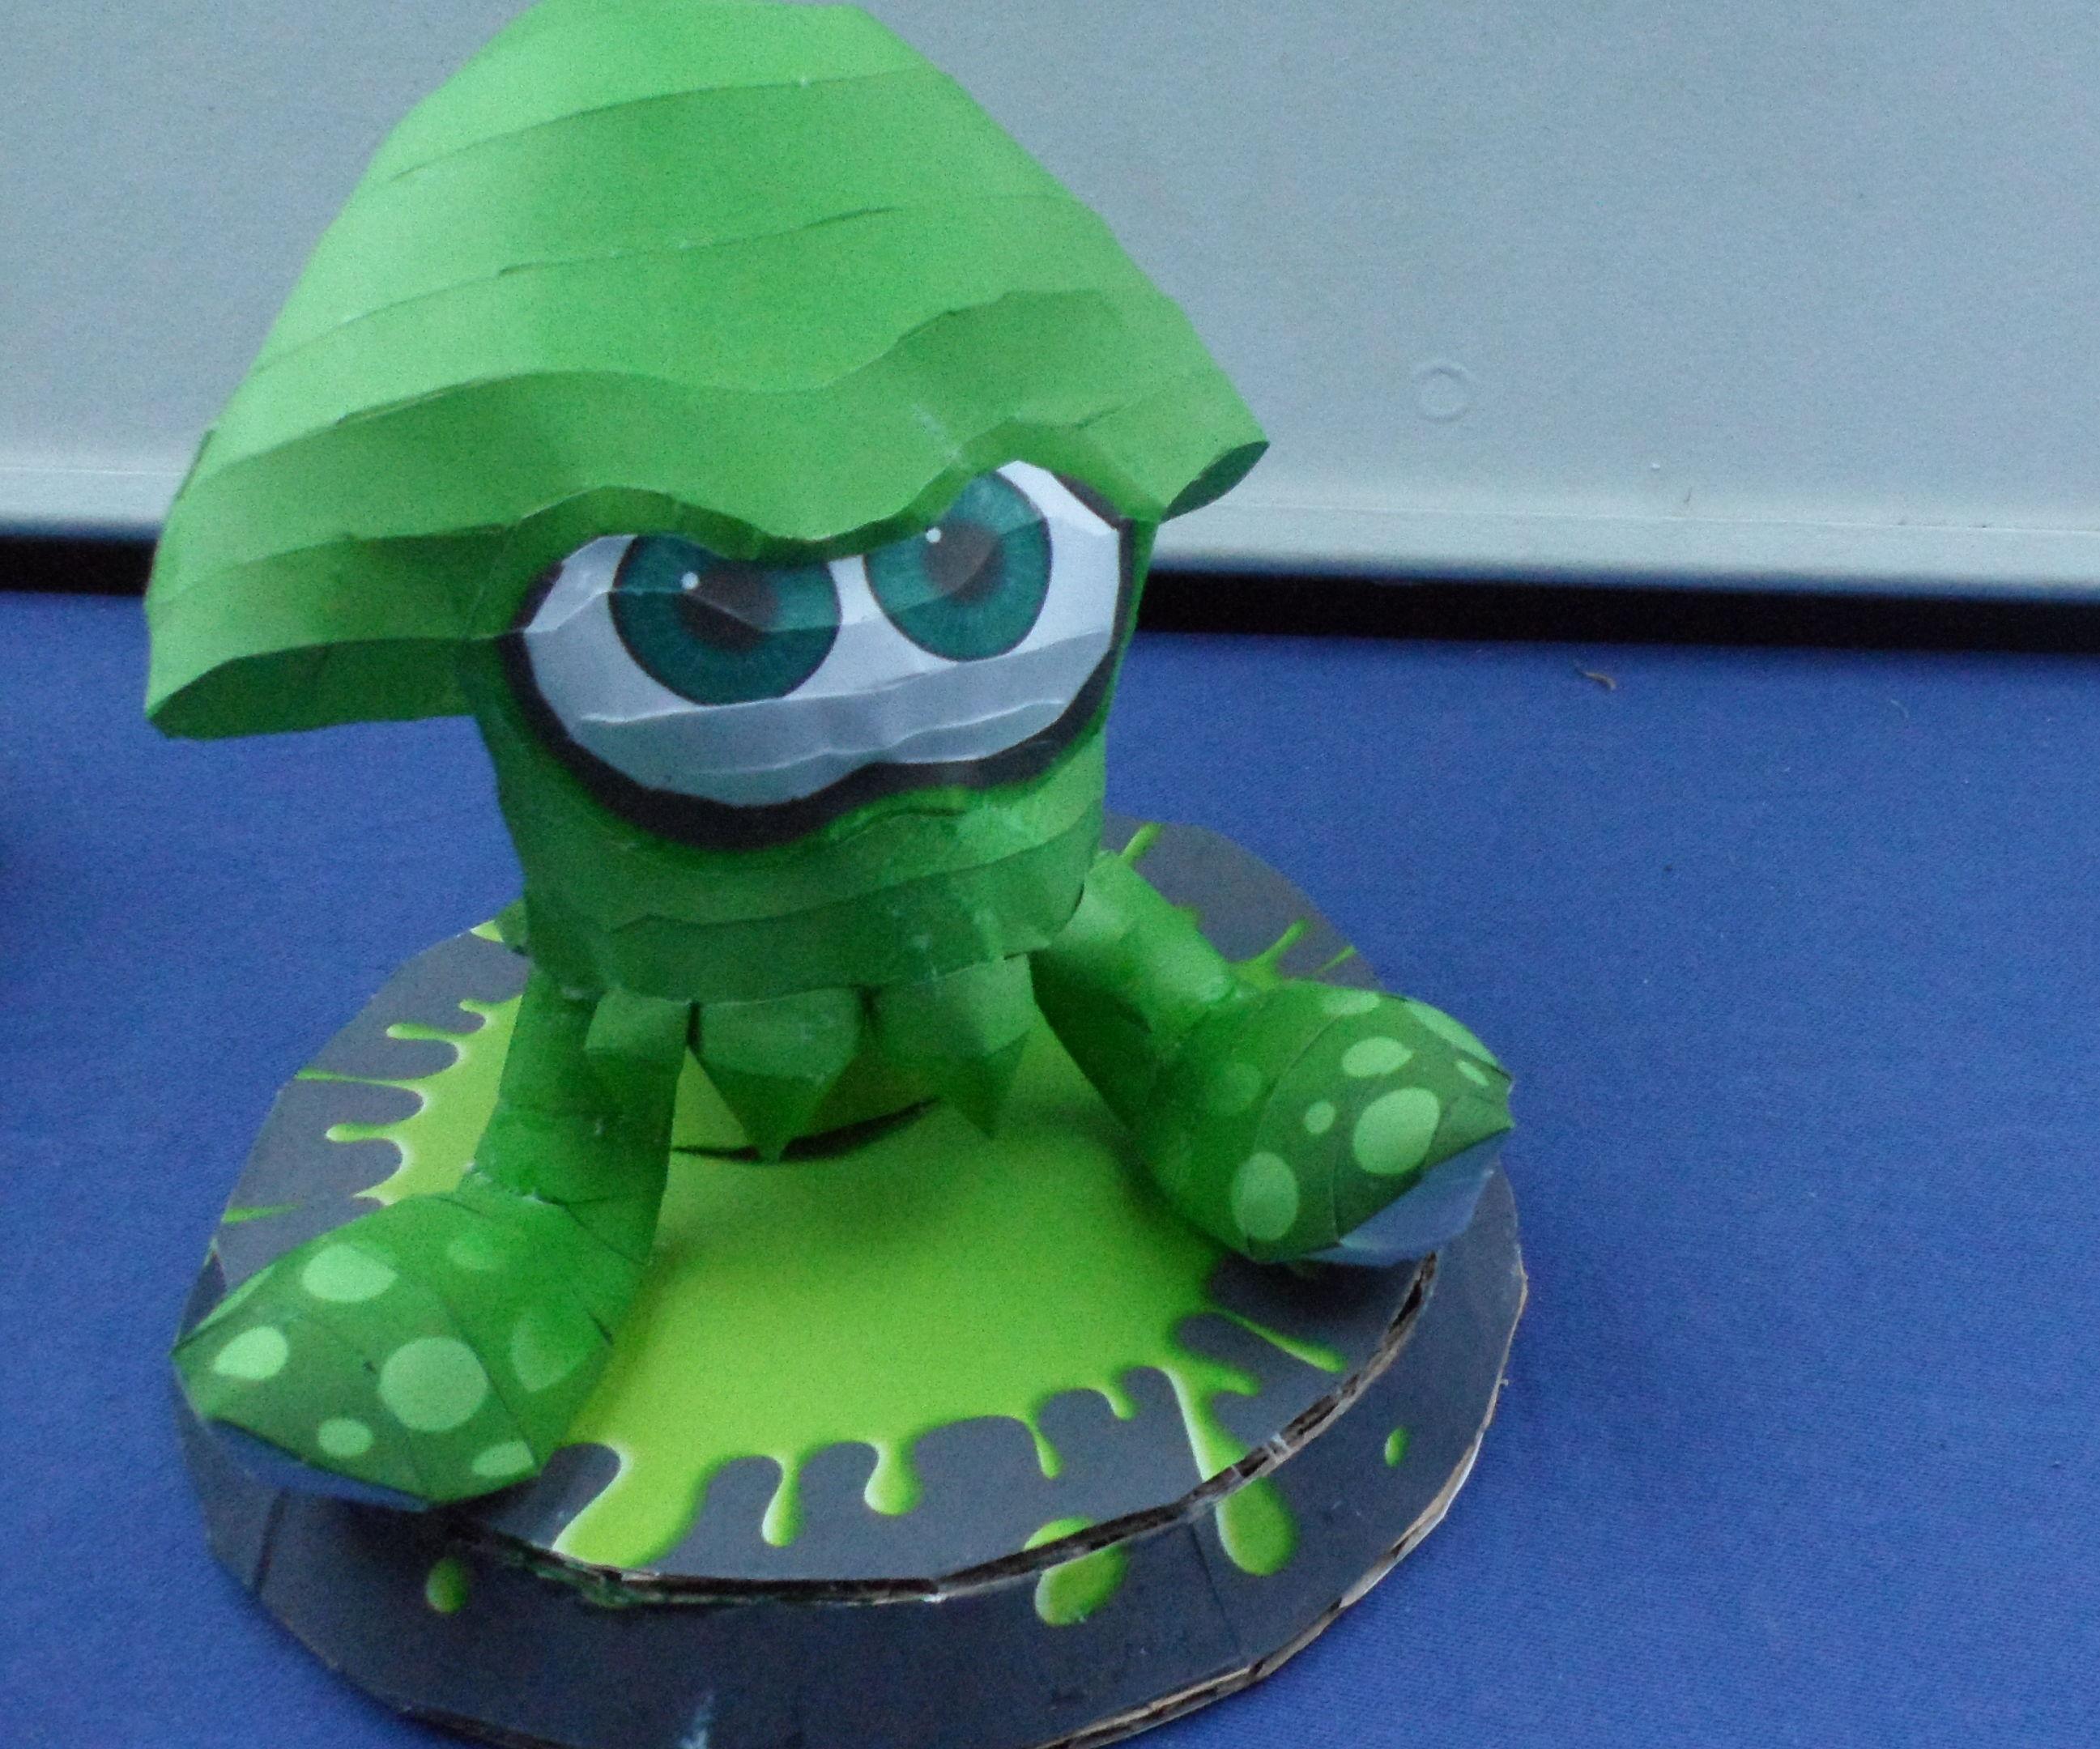 Splatoon Papercraft: Green Squid